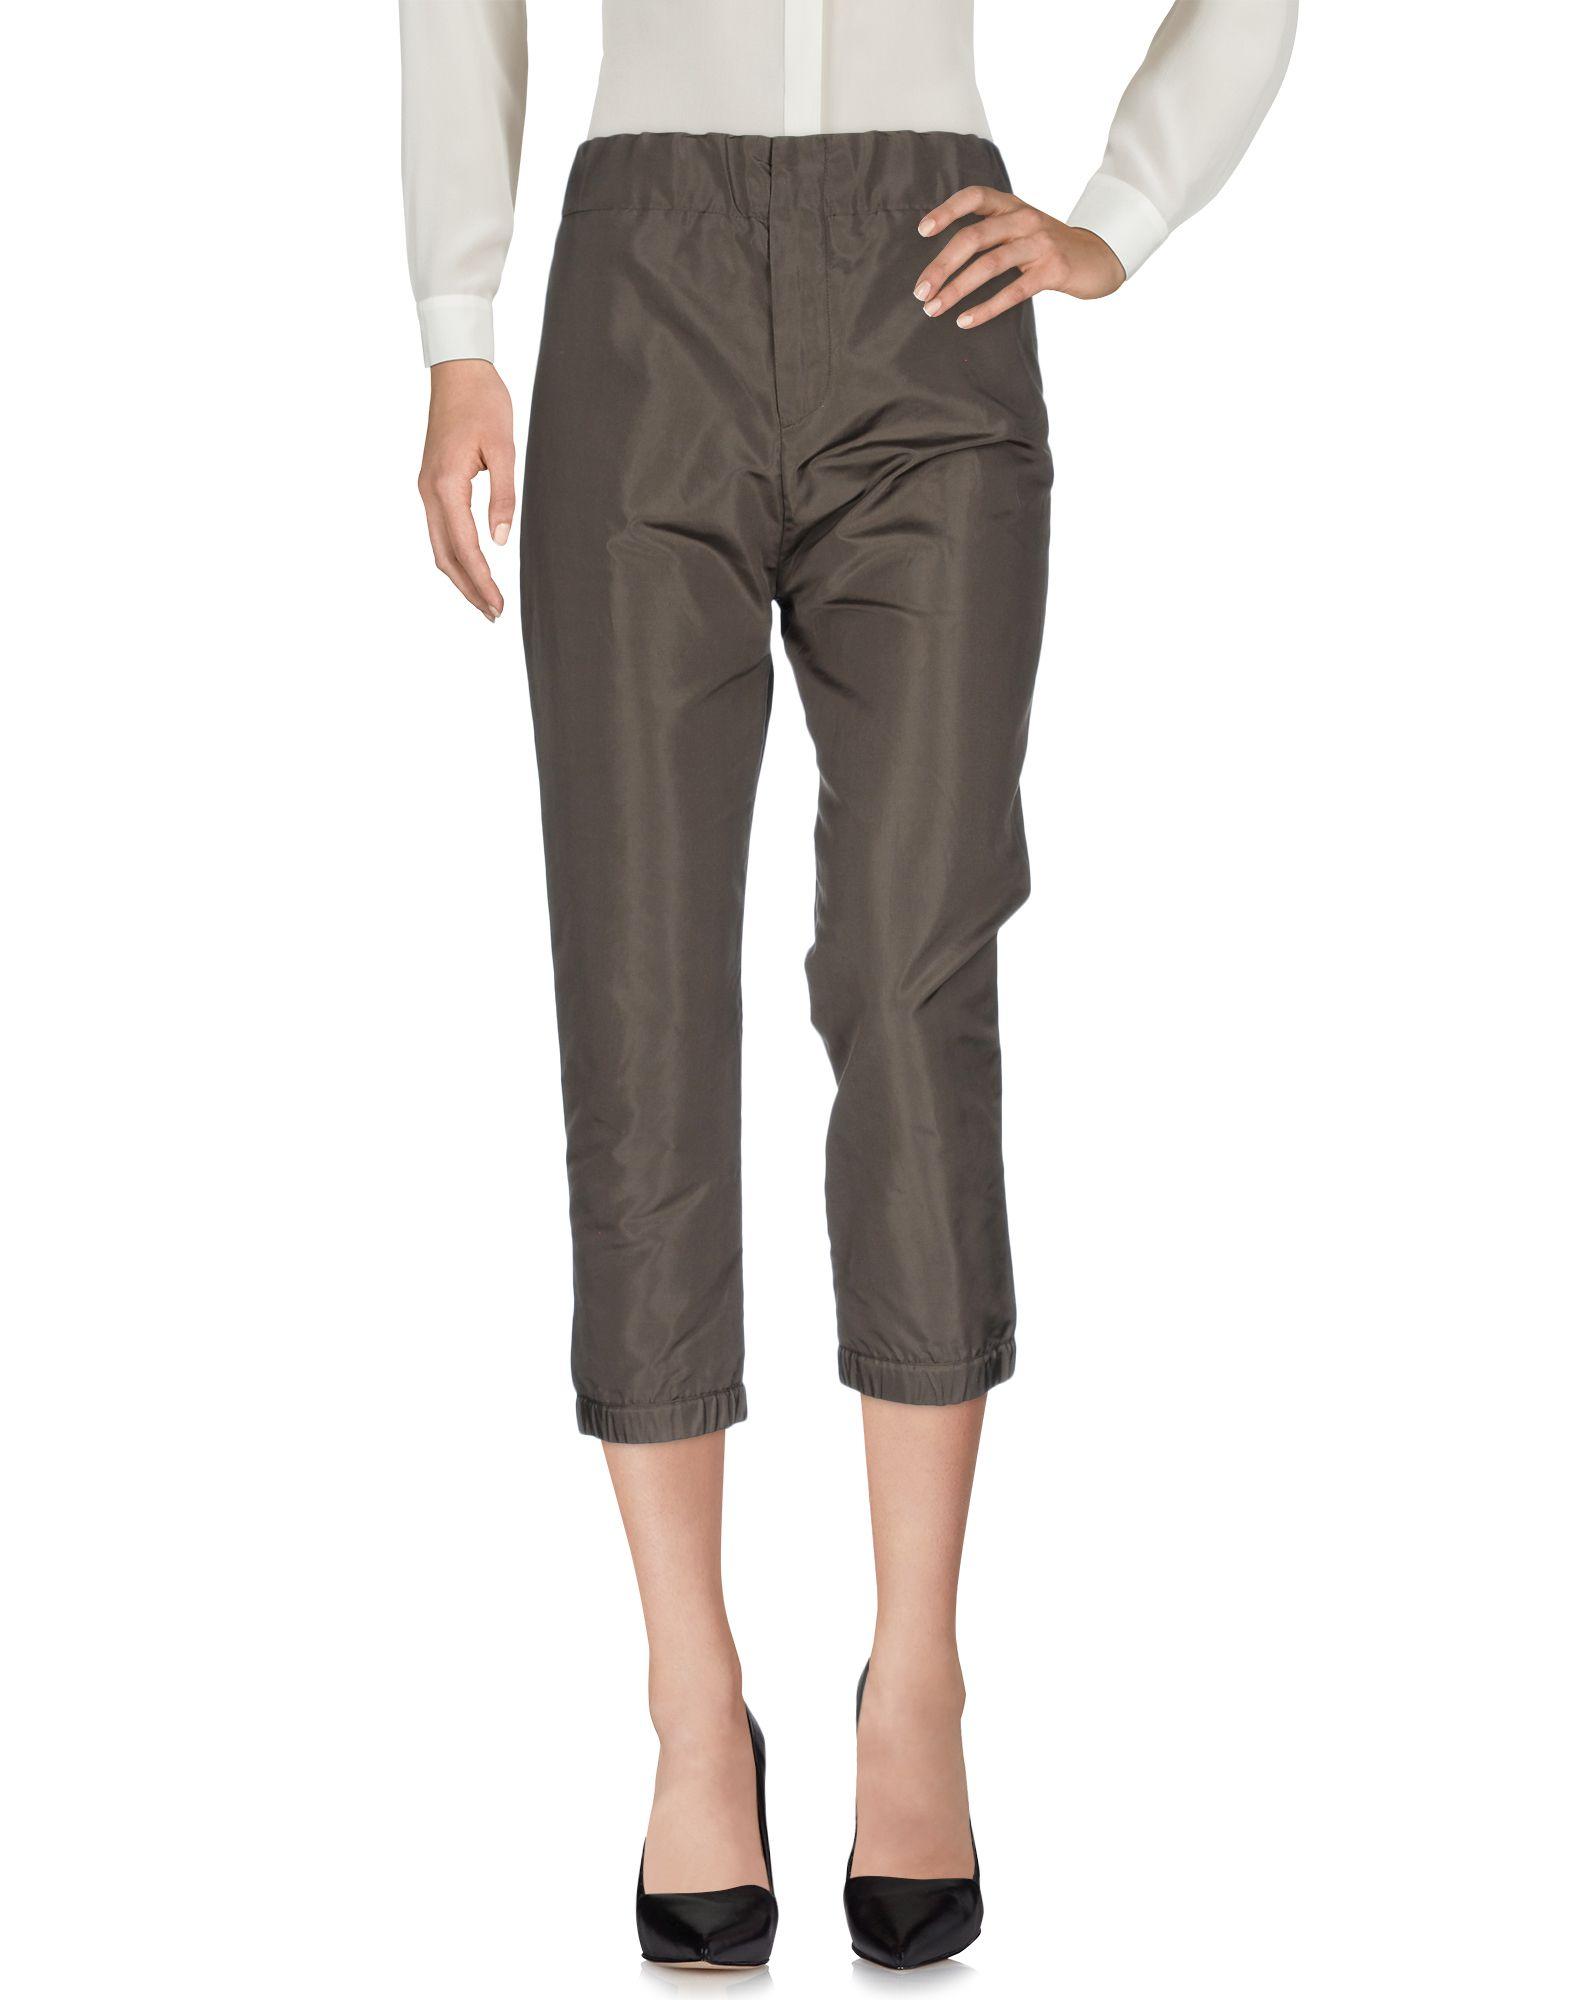 MARNI Damen Hose Farbe Grau Größe 4